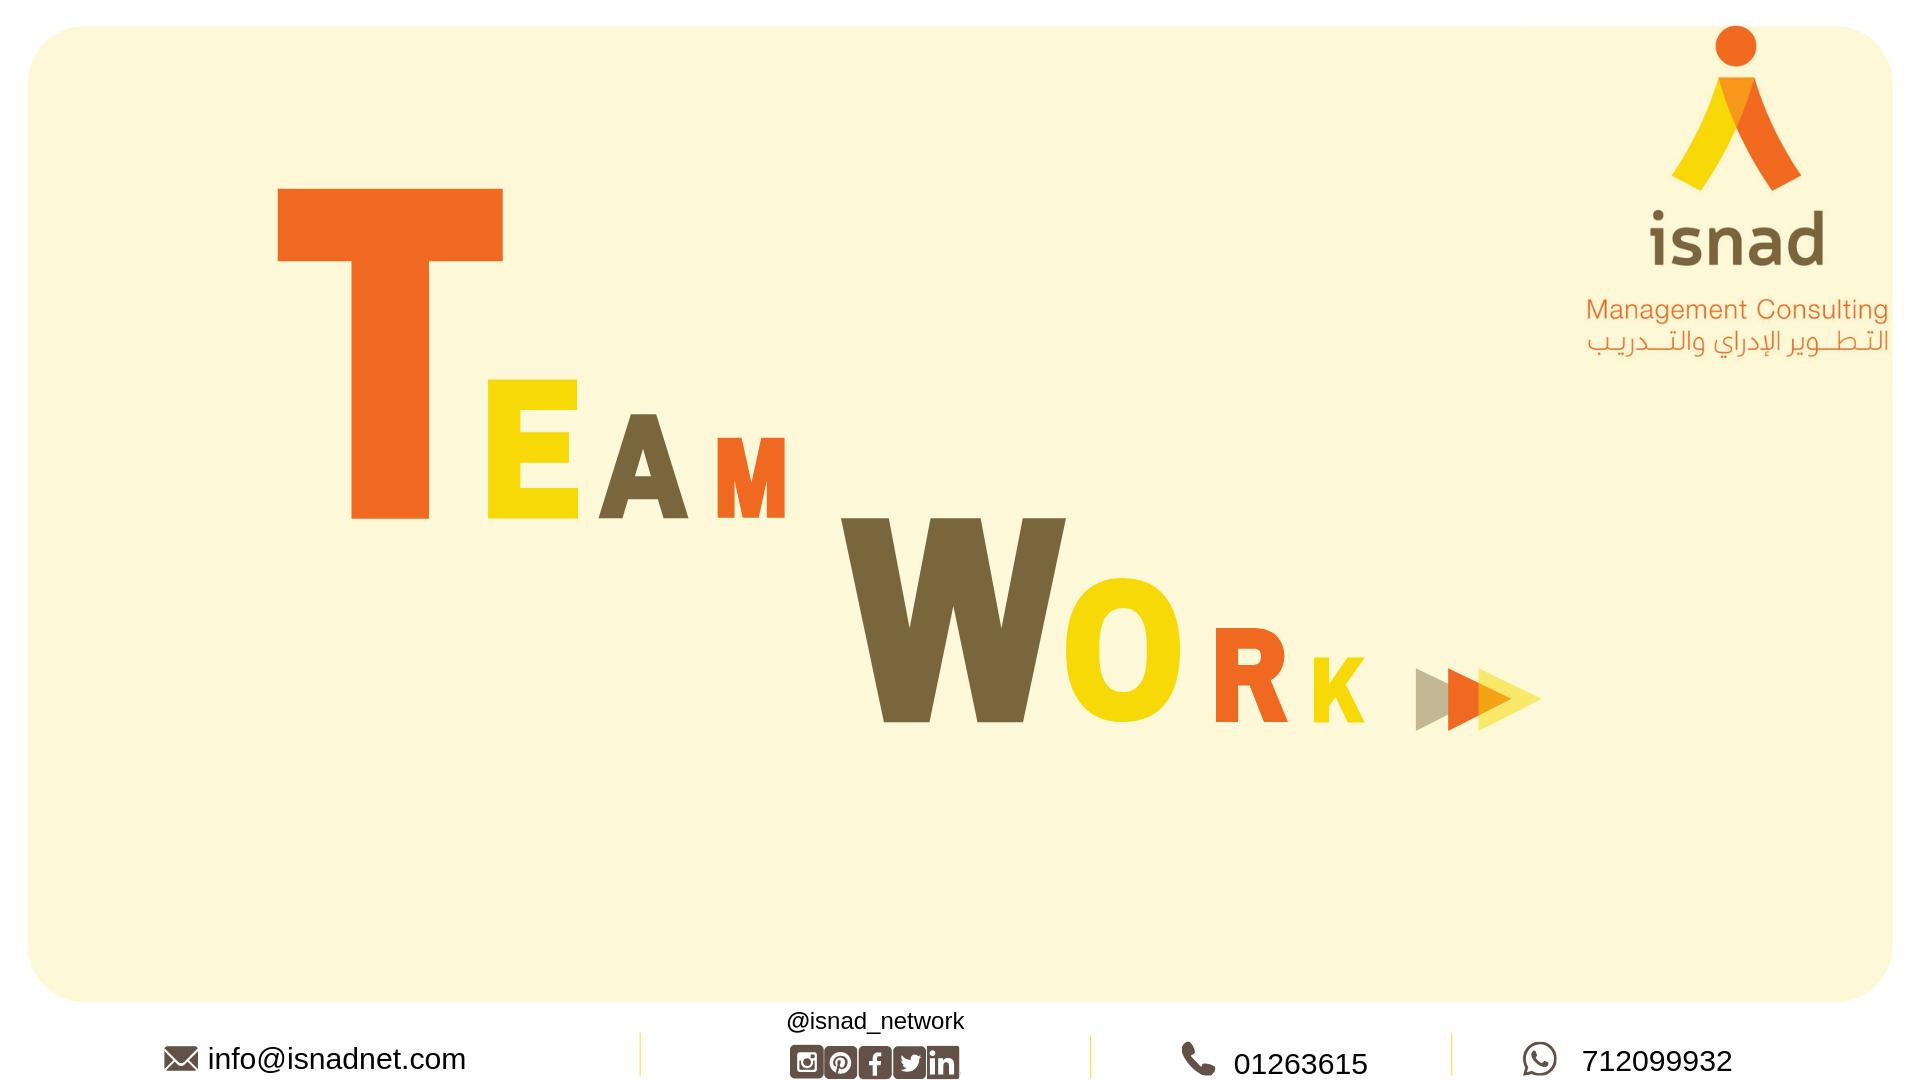 فريق العمل Tech Company Logos Company Logo Management